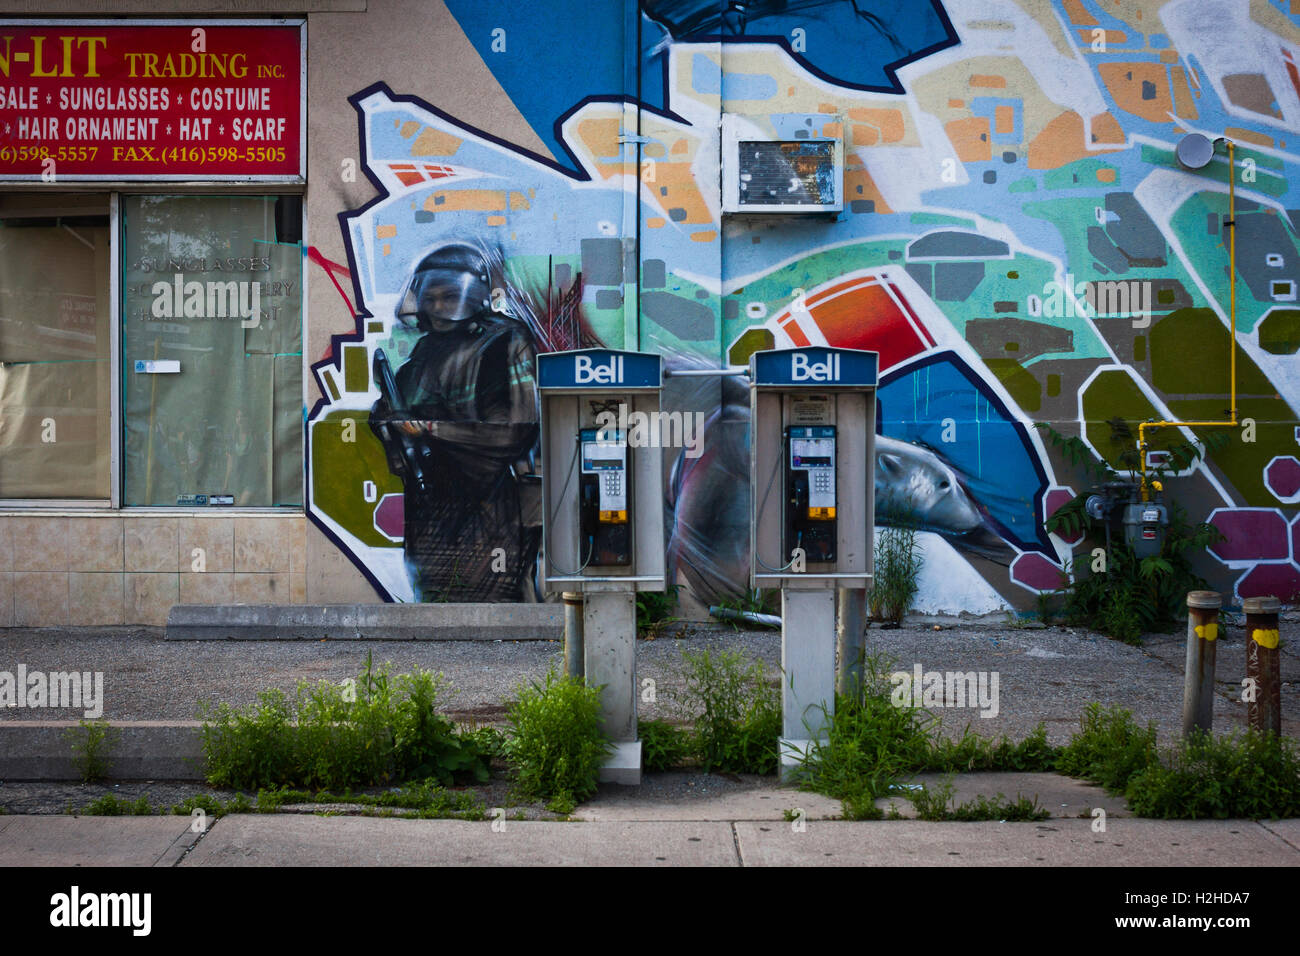 Graffiti art for sale canada - Public Telephone Boxes In The Chinatown Area Of Toronto Canada